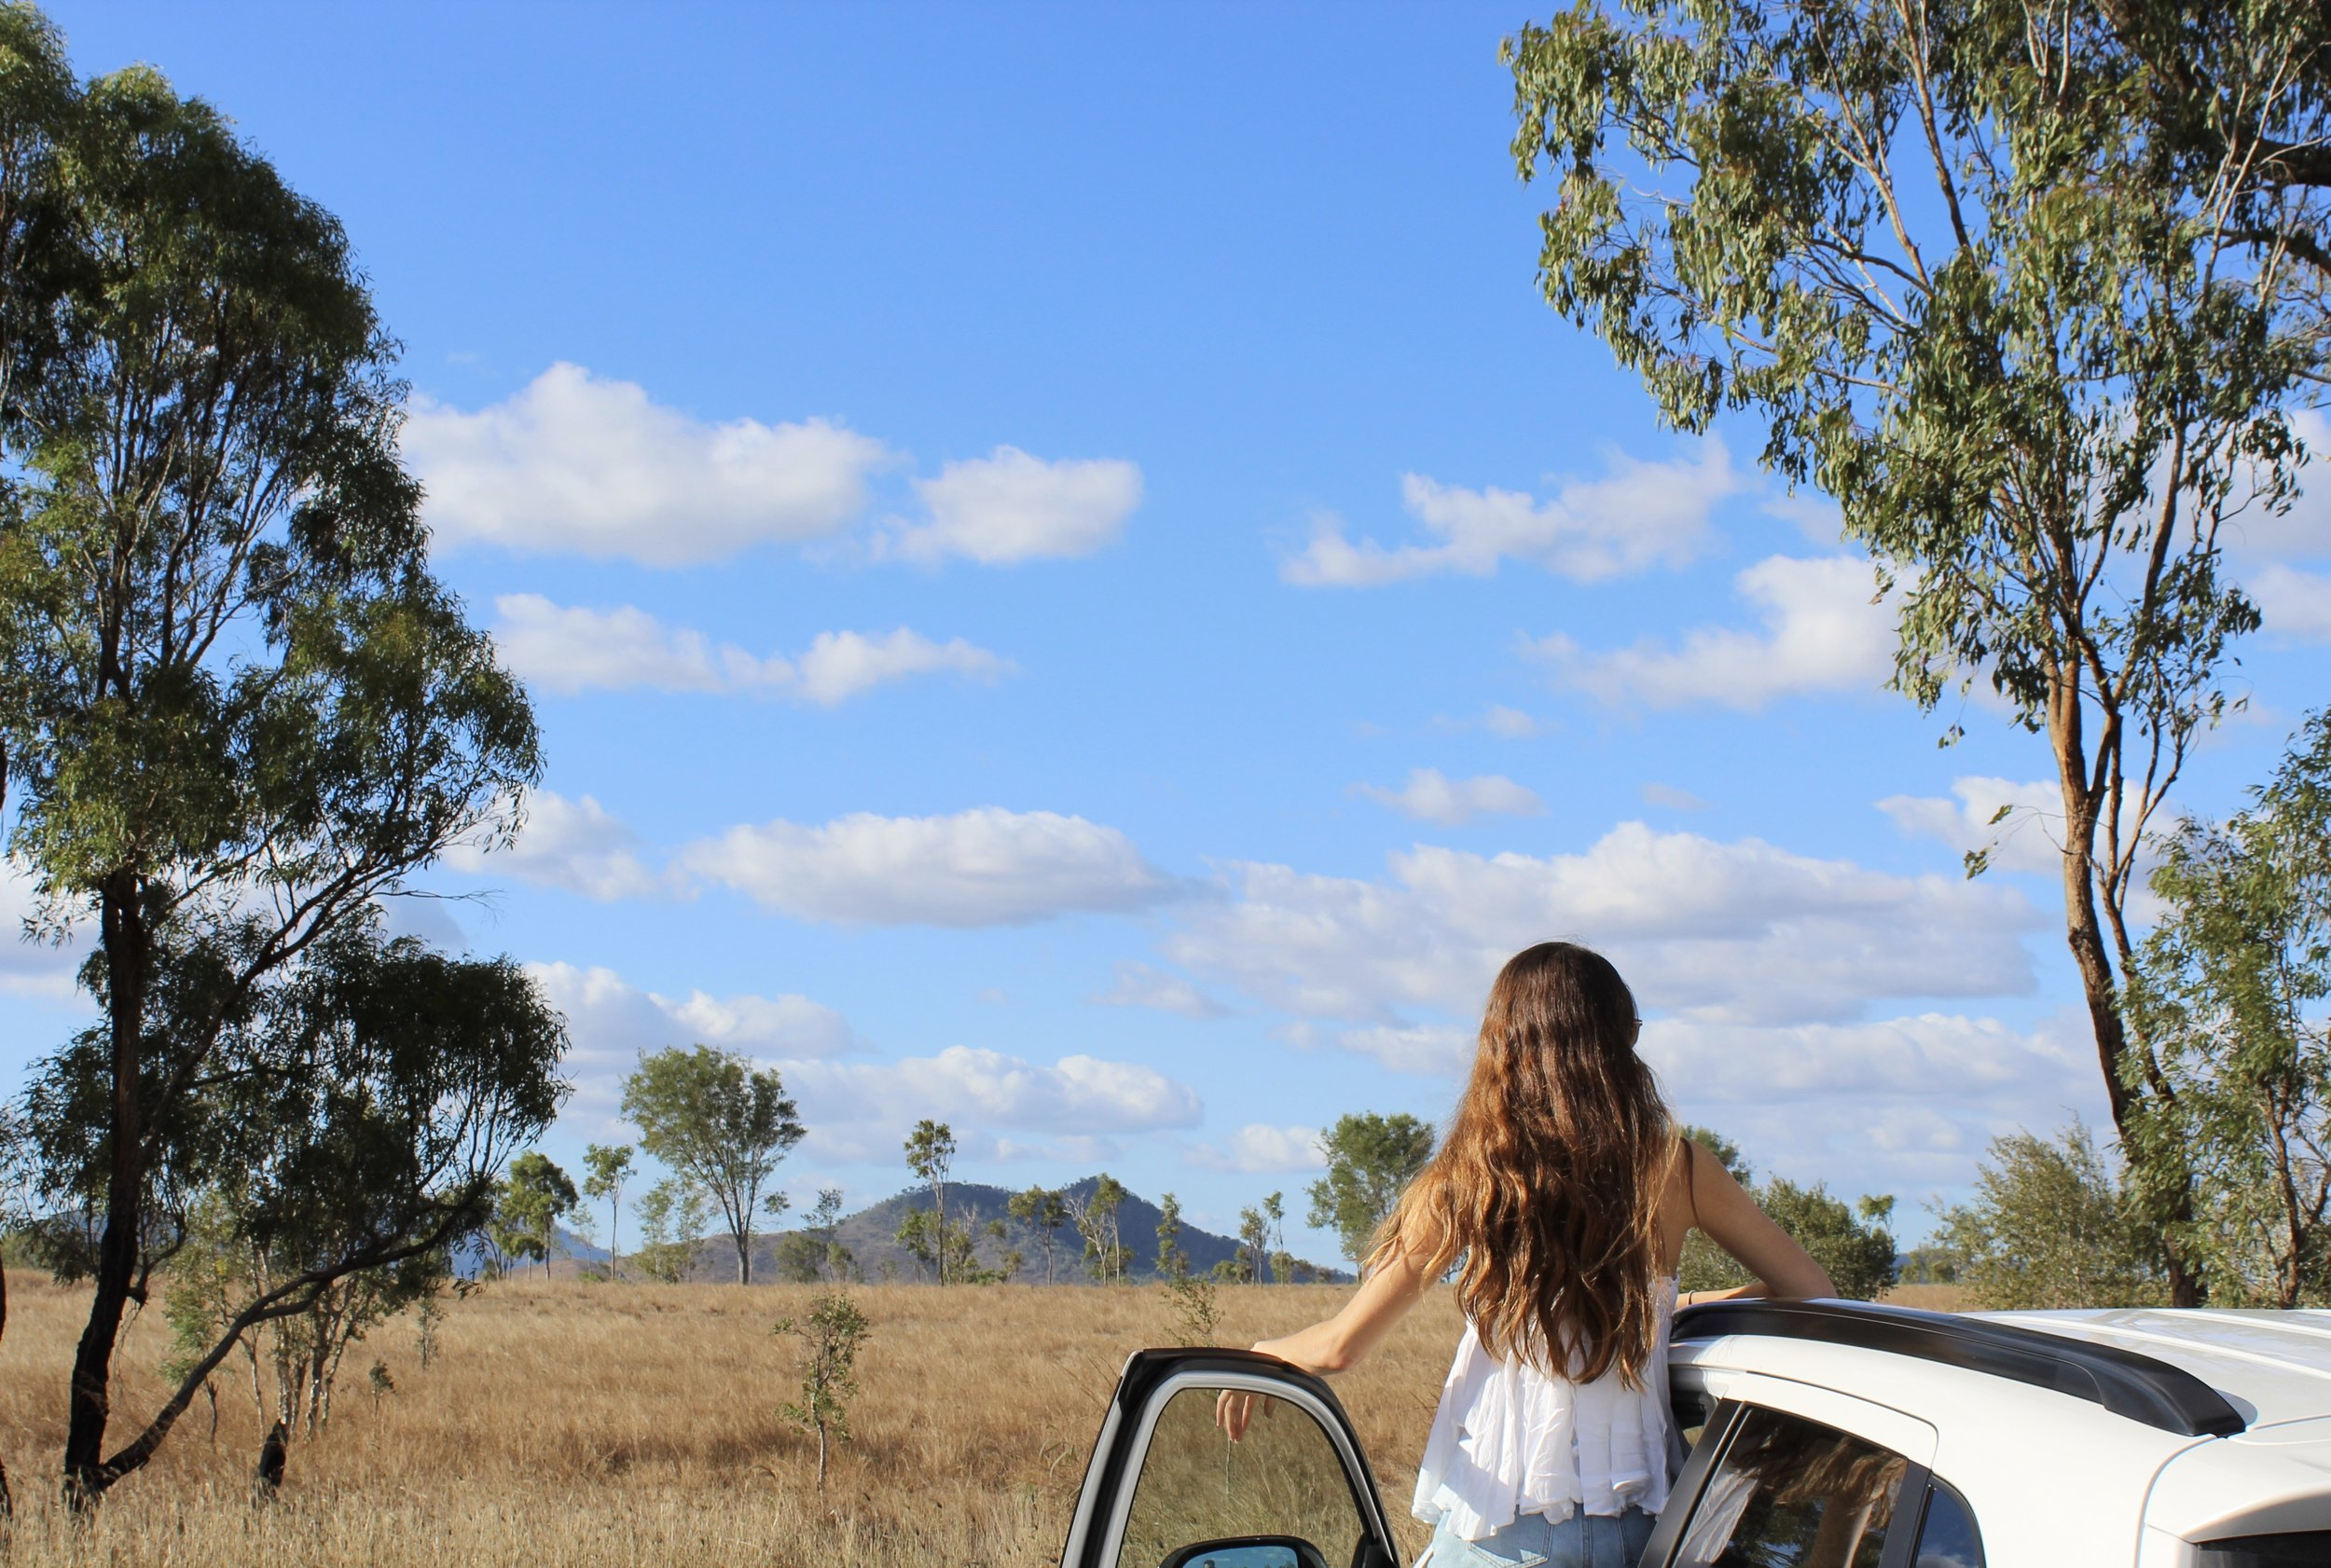 Somewhere near Queensland, Australia